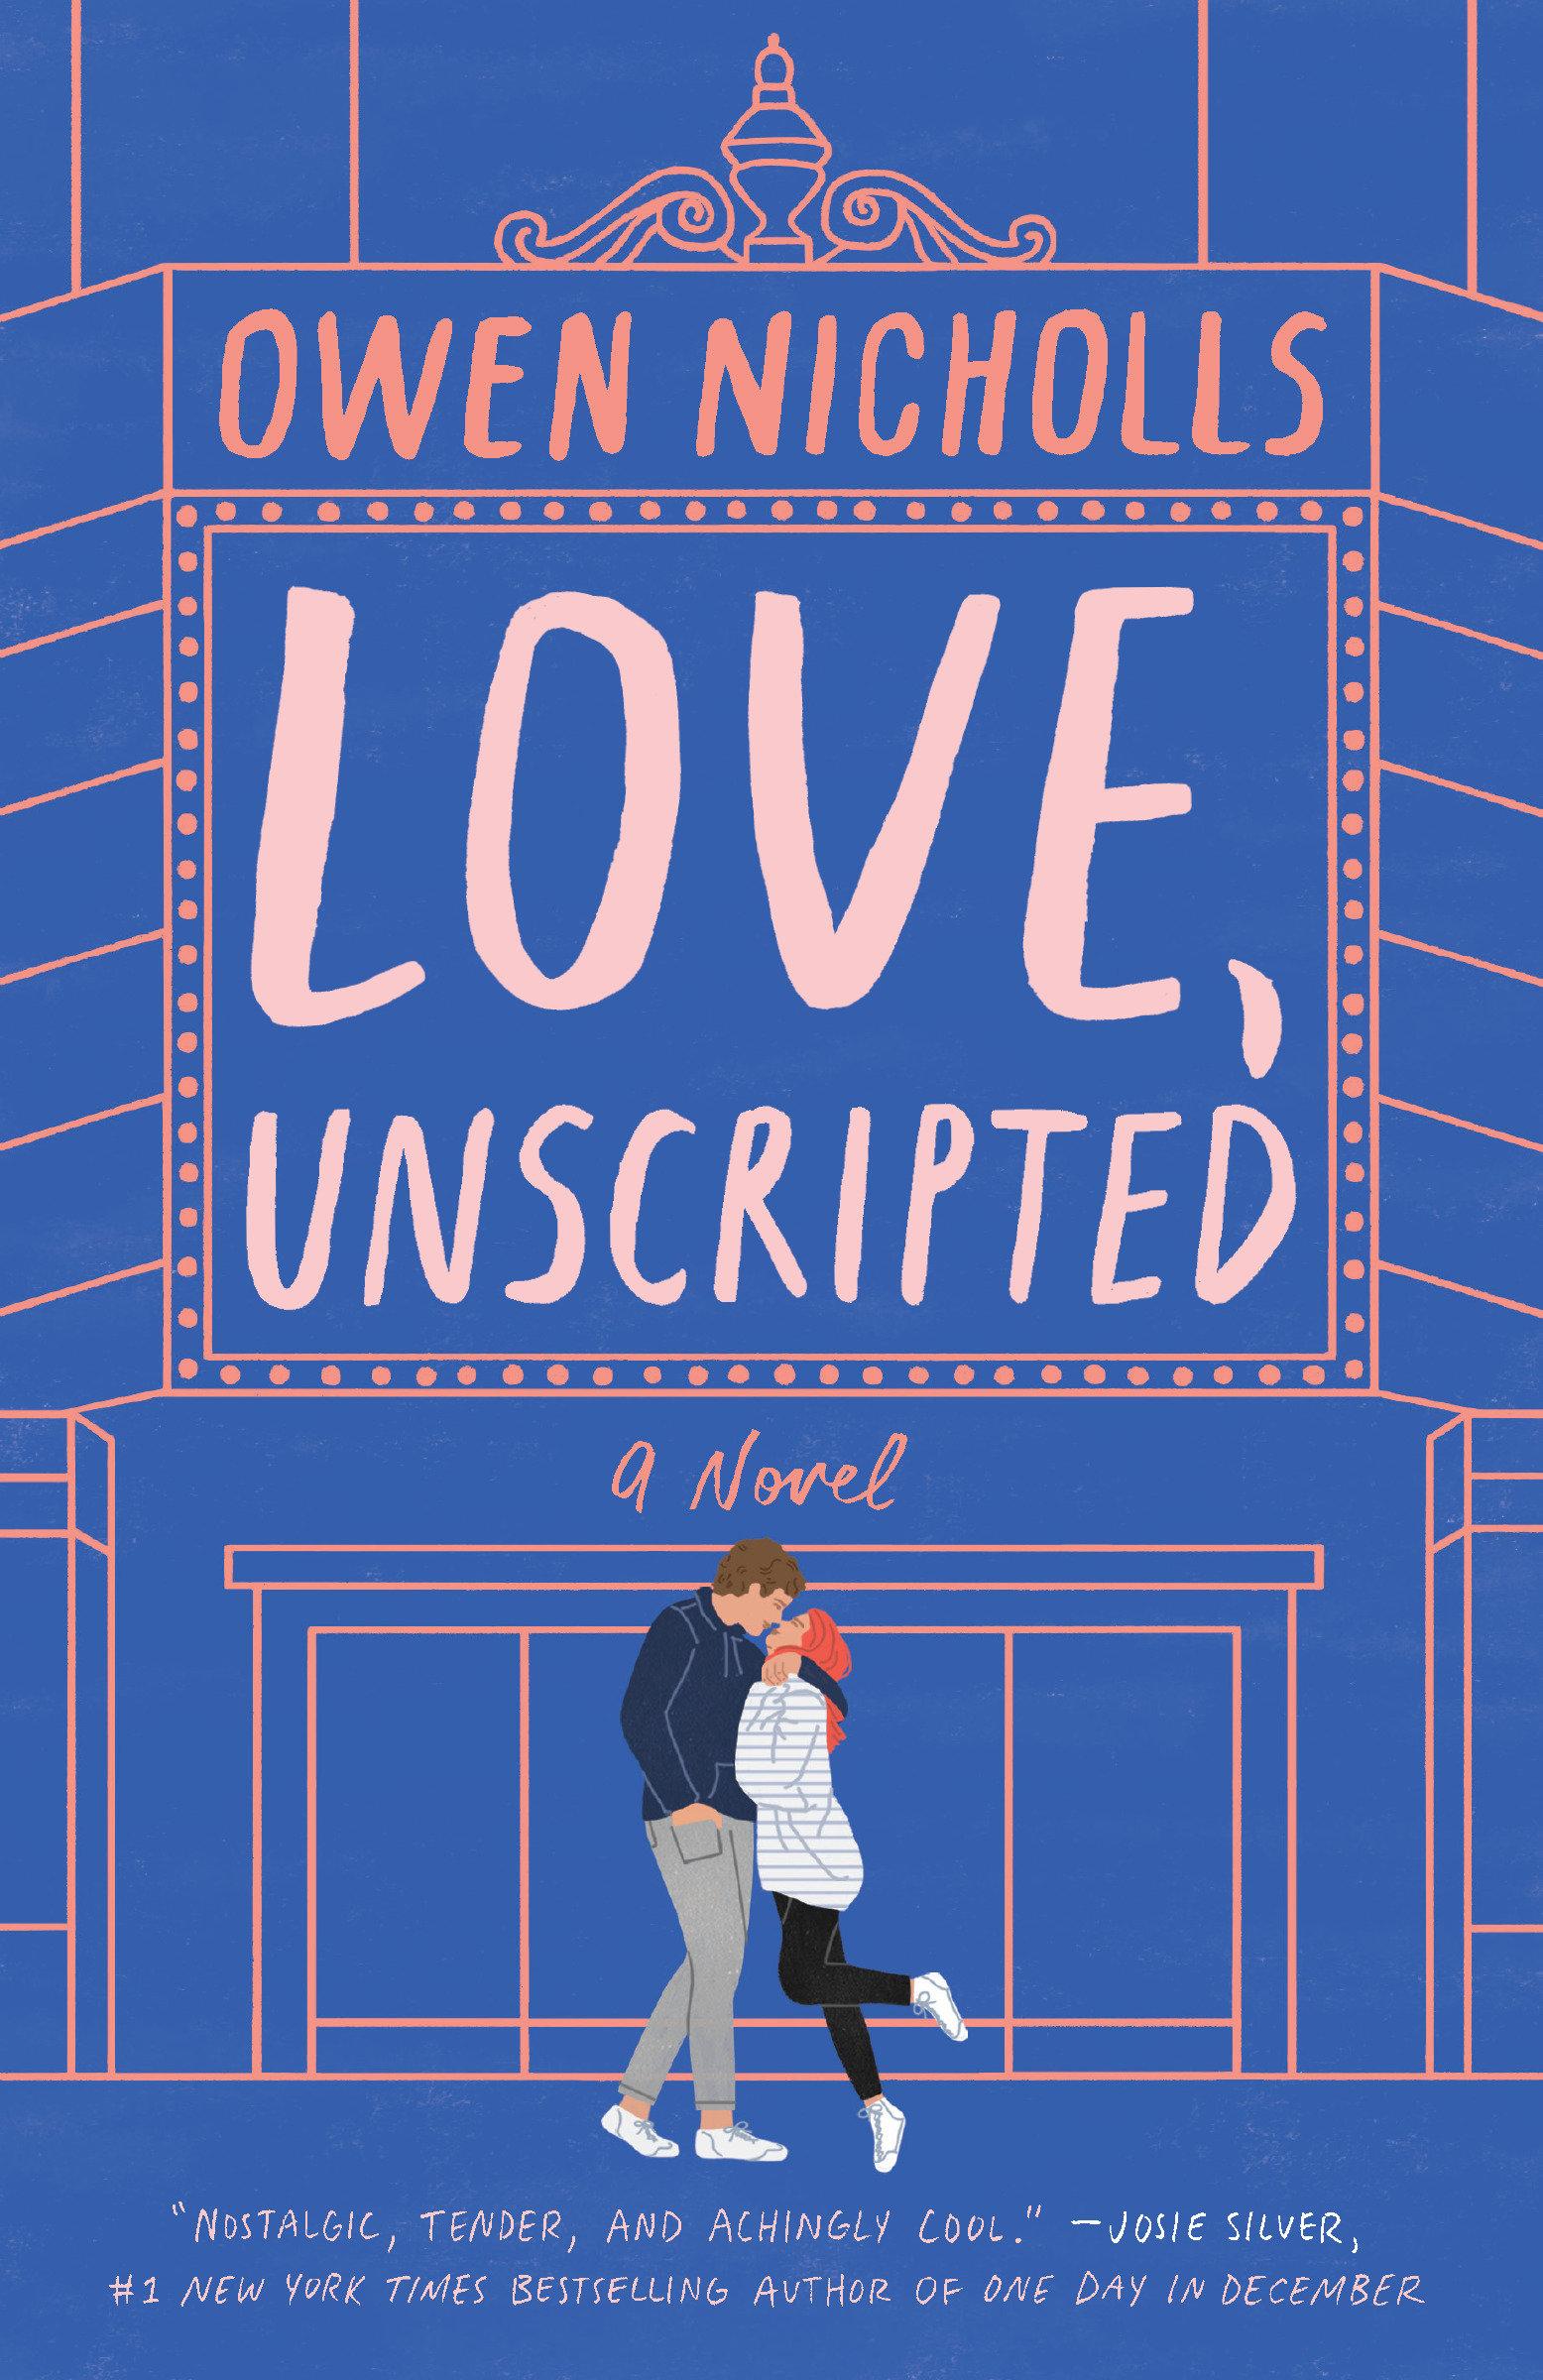 Love, unscripted a novel